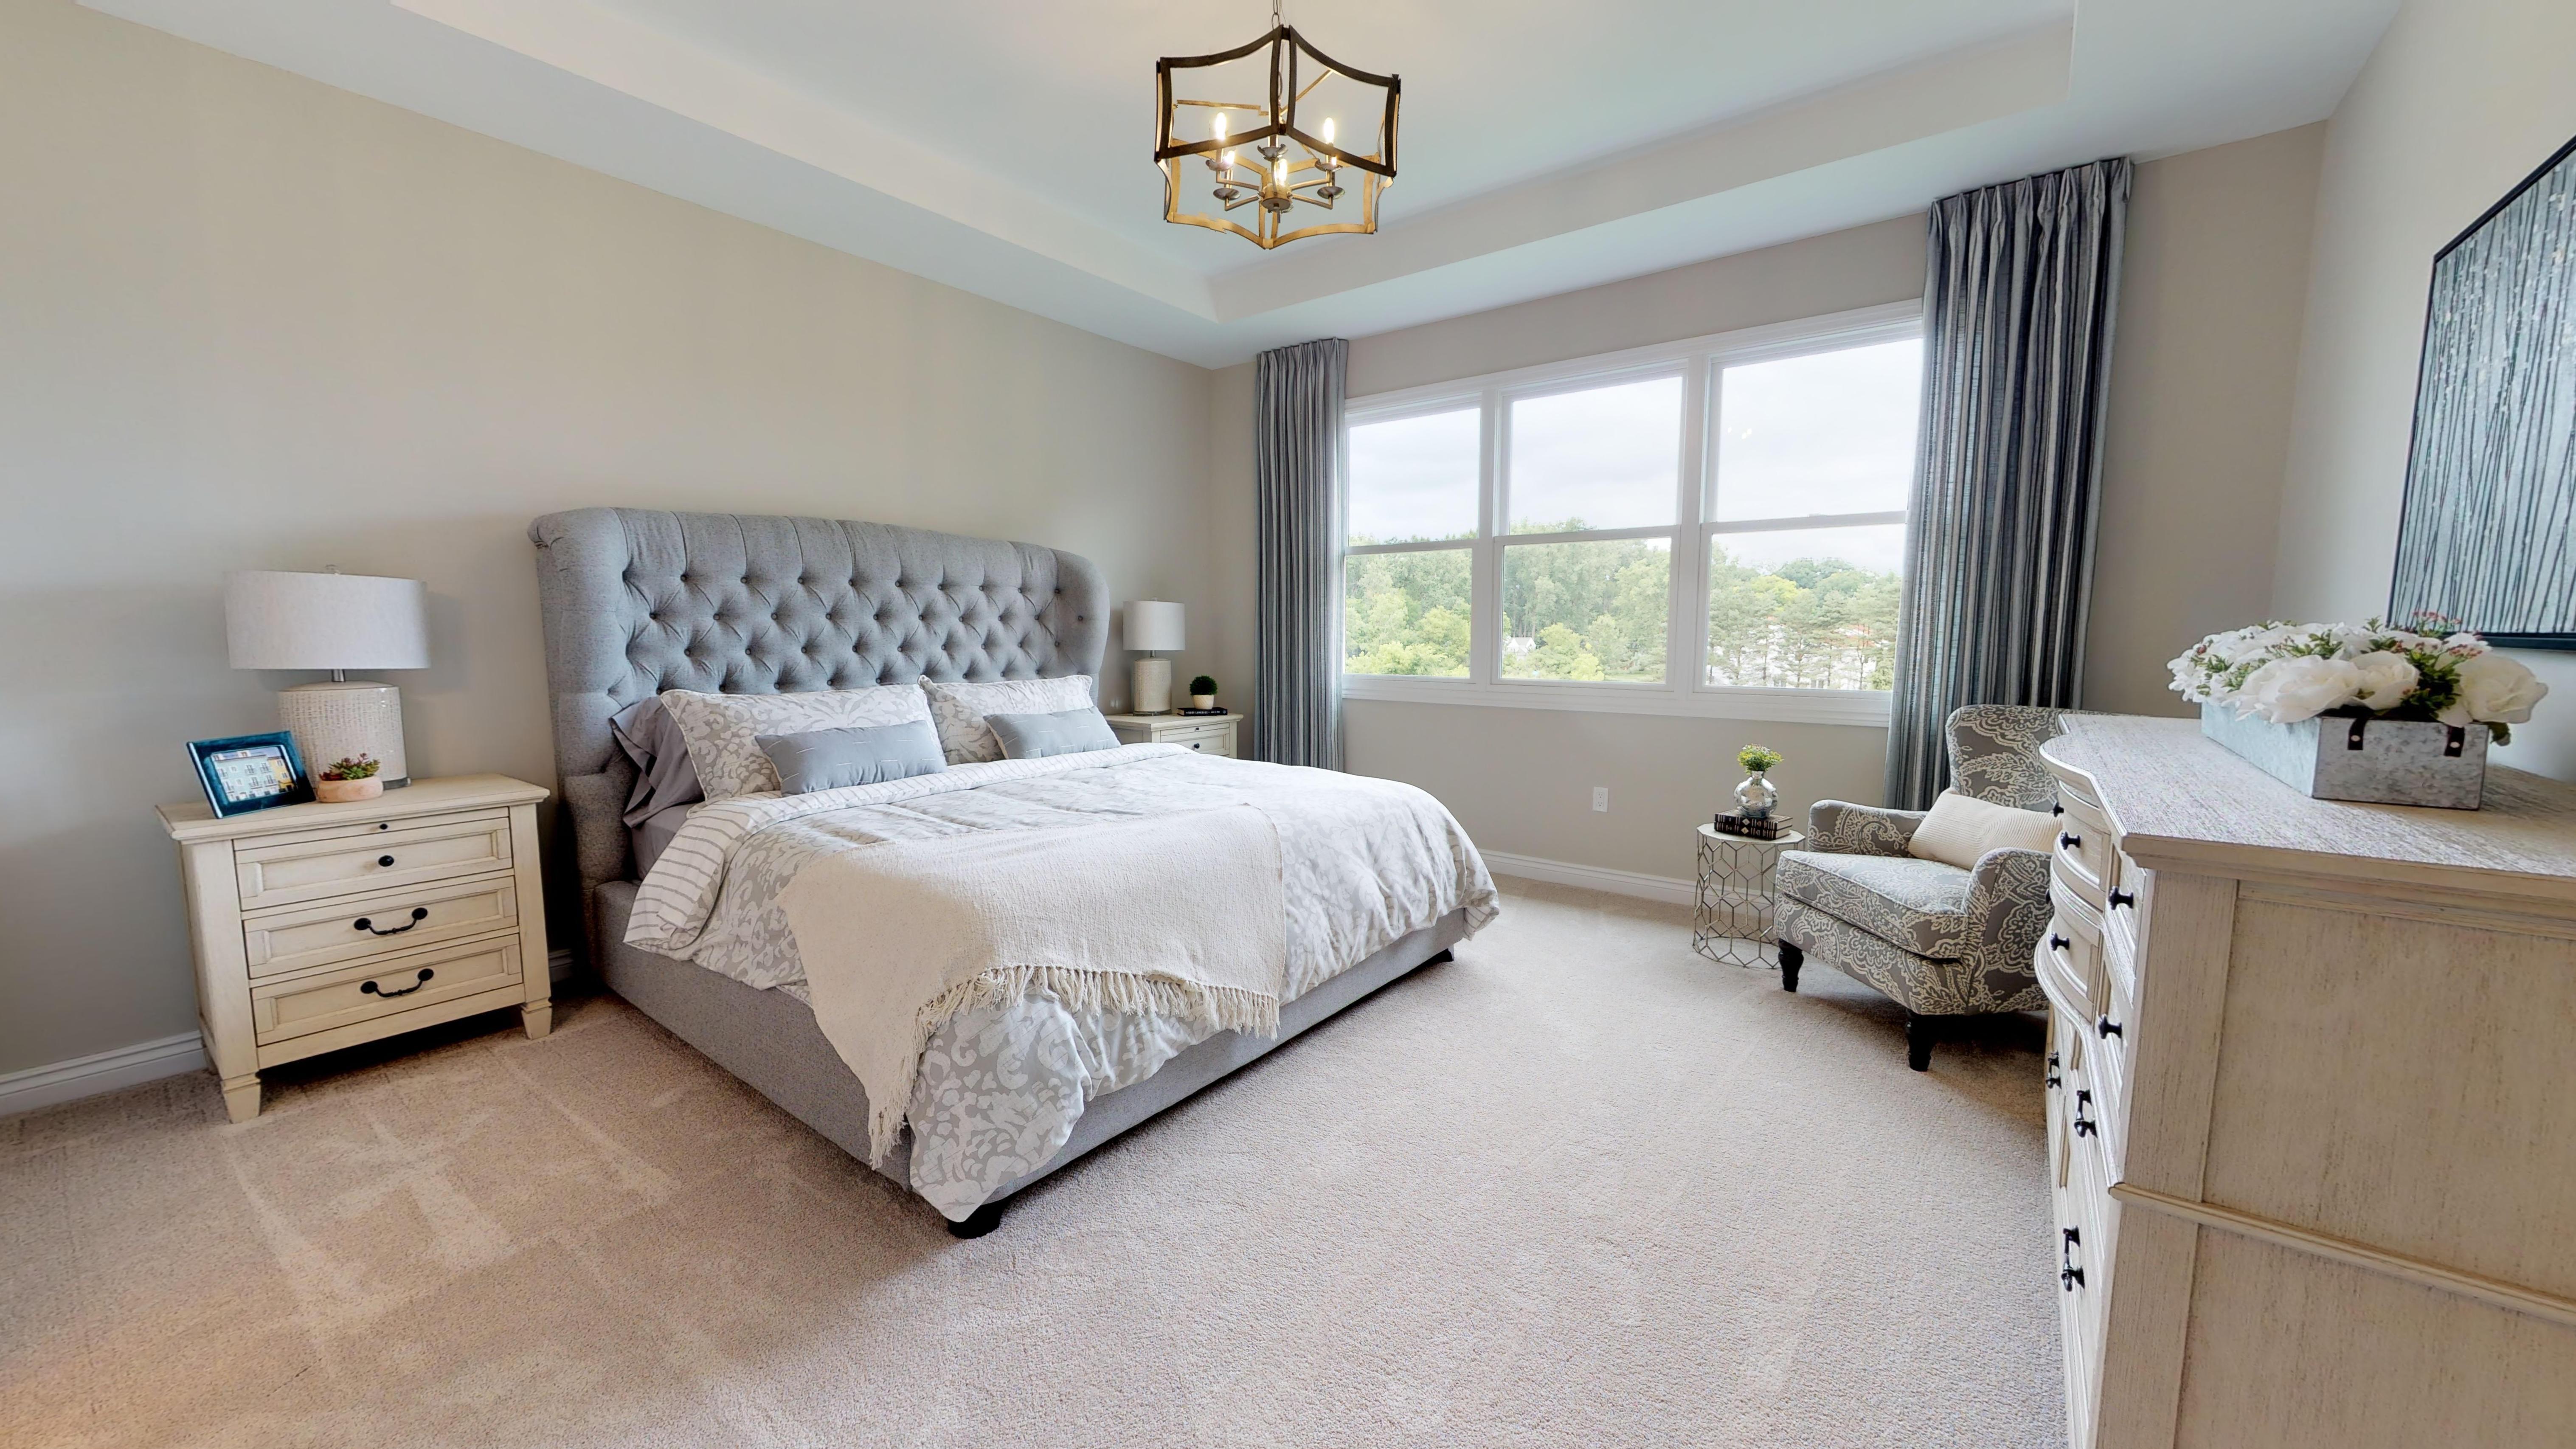 Bedroom featured in The Mackinac By AP Builders in Detroit, MI